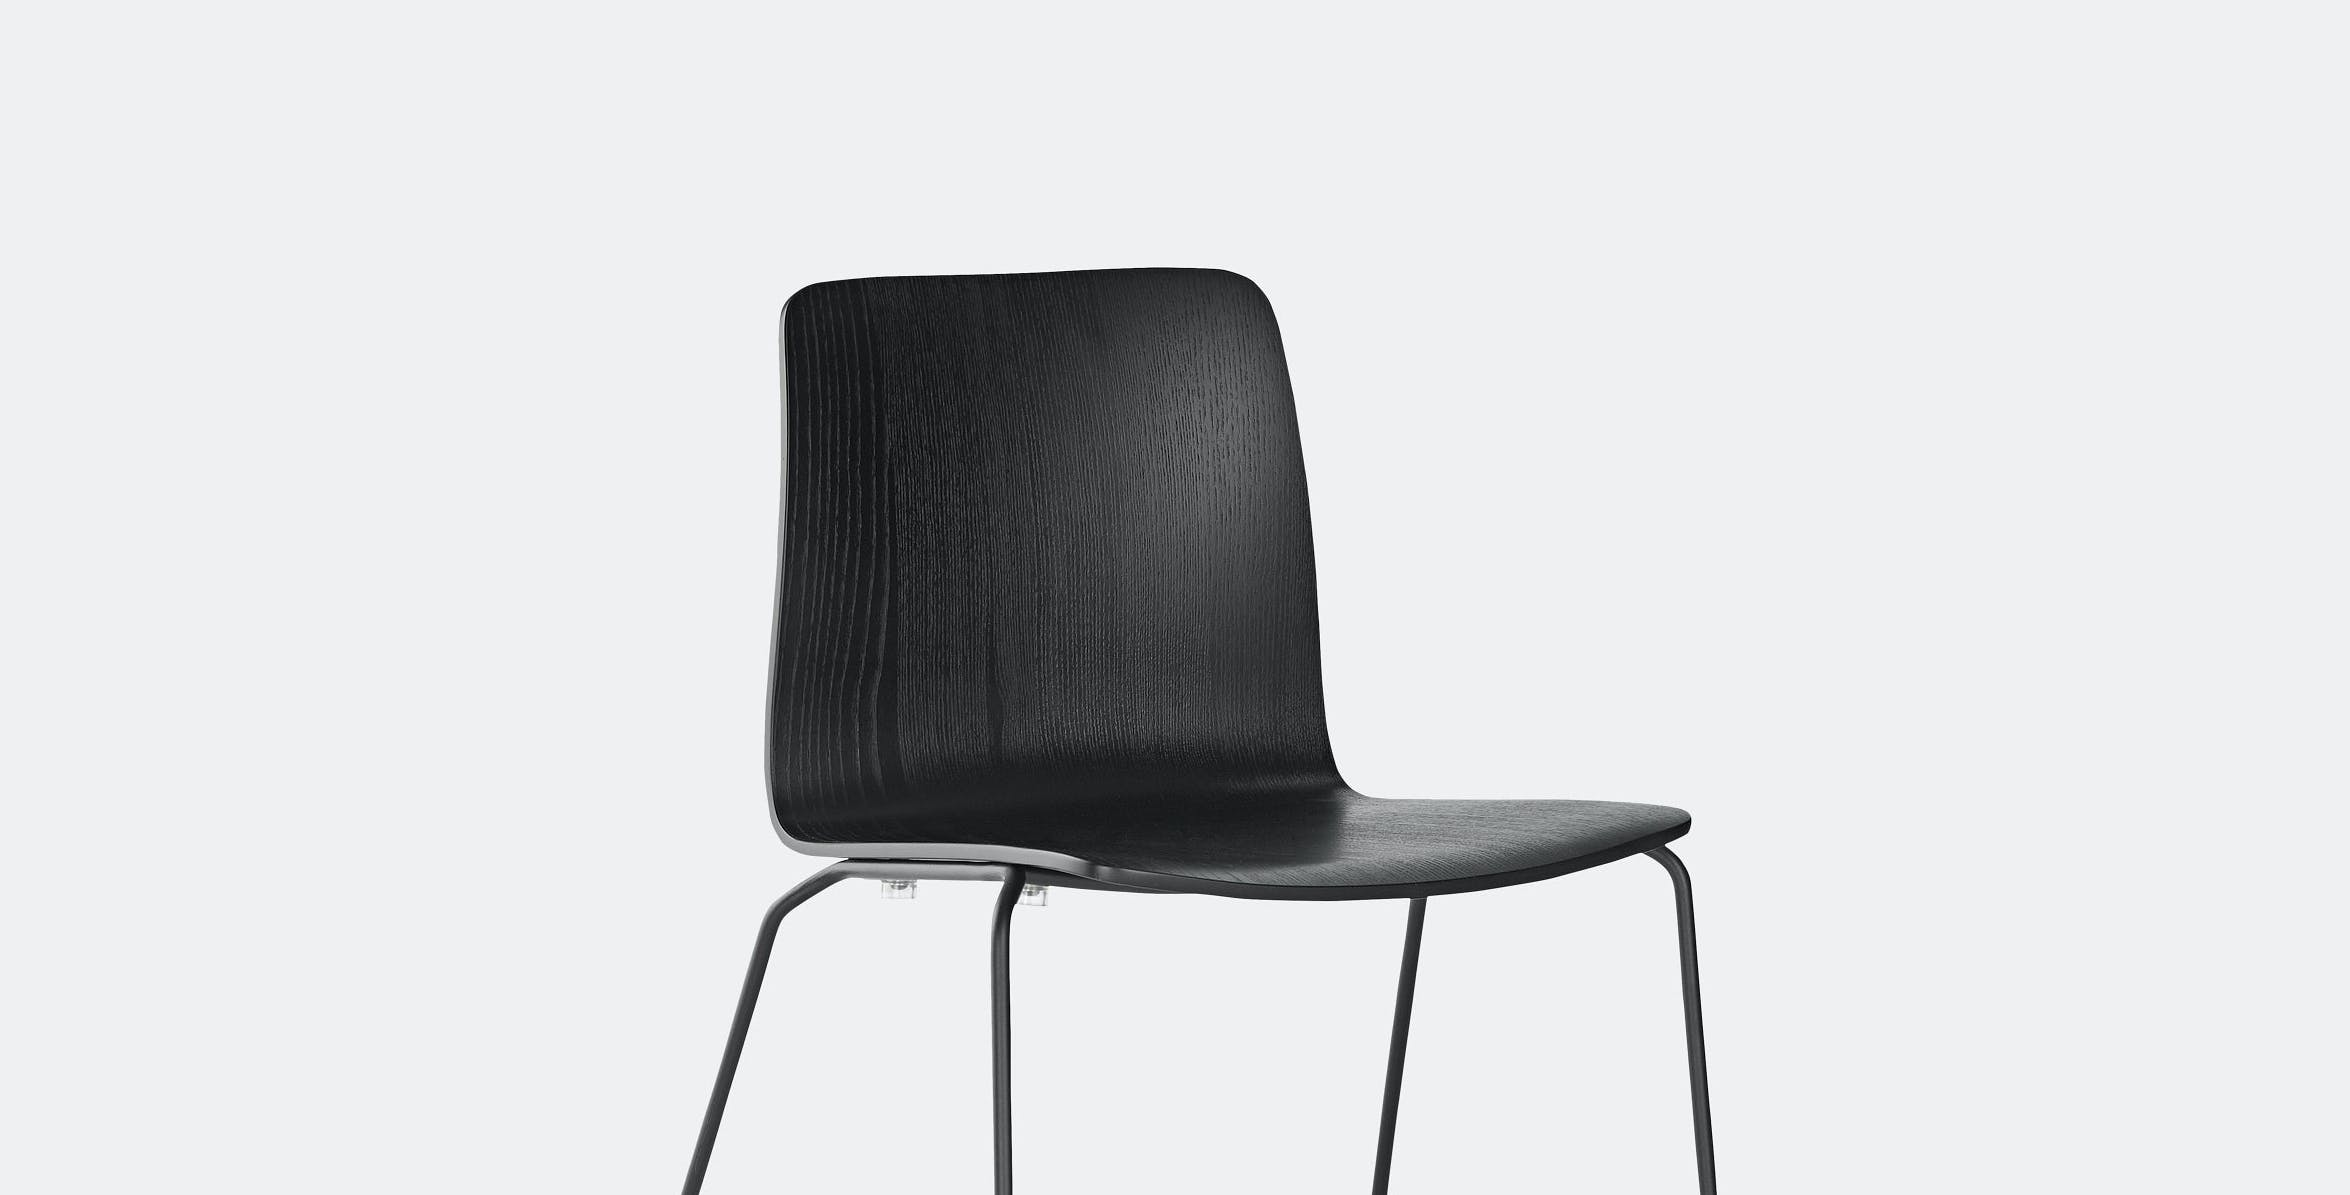 Designers Jakob Wagner